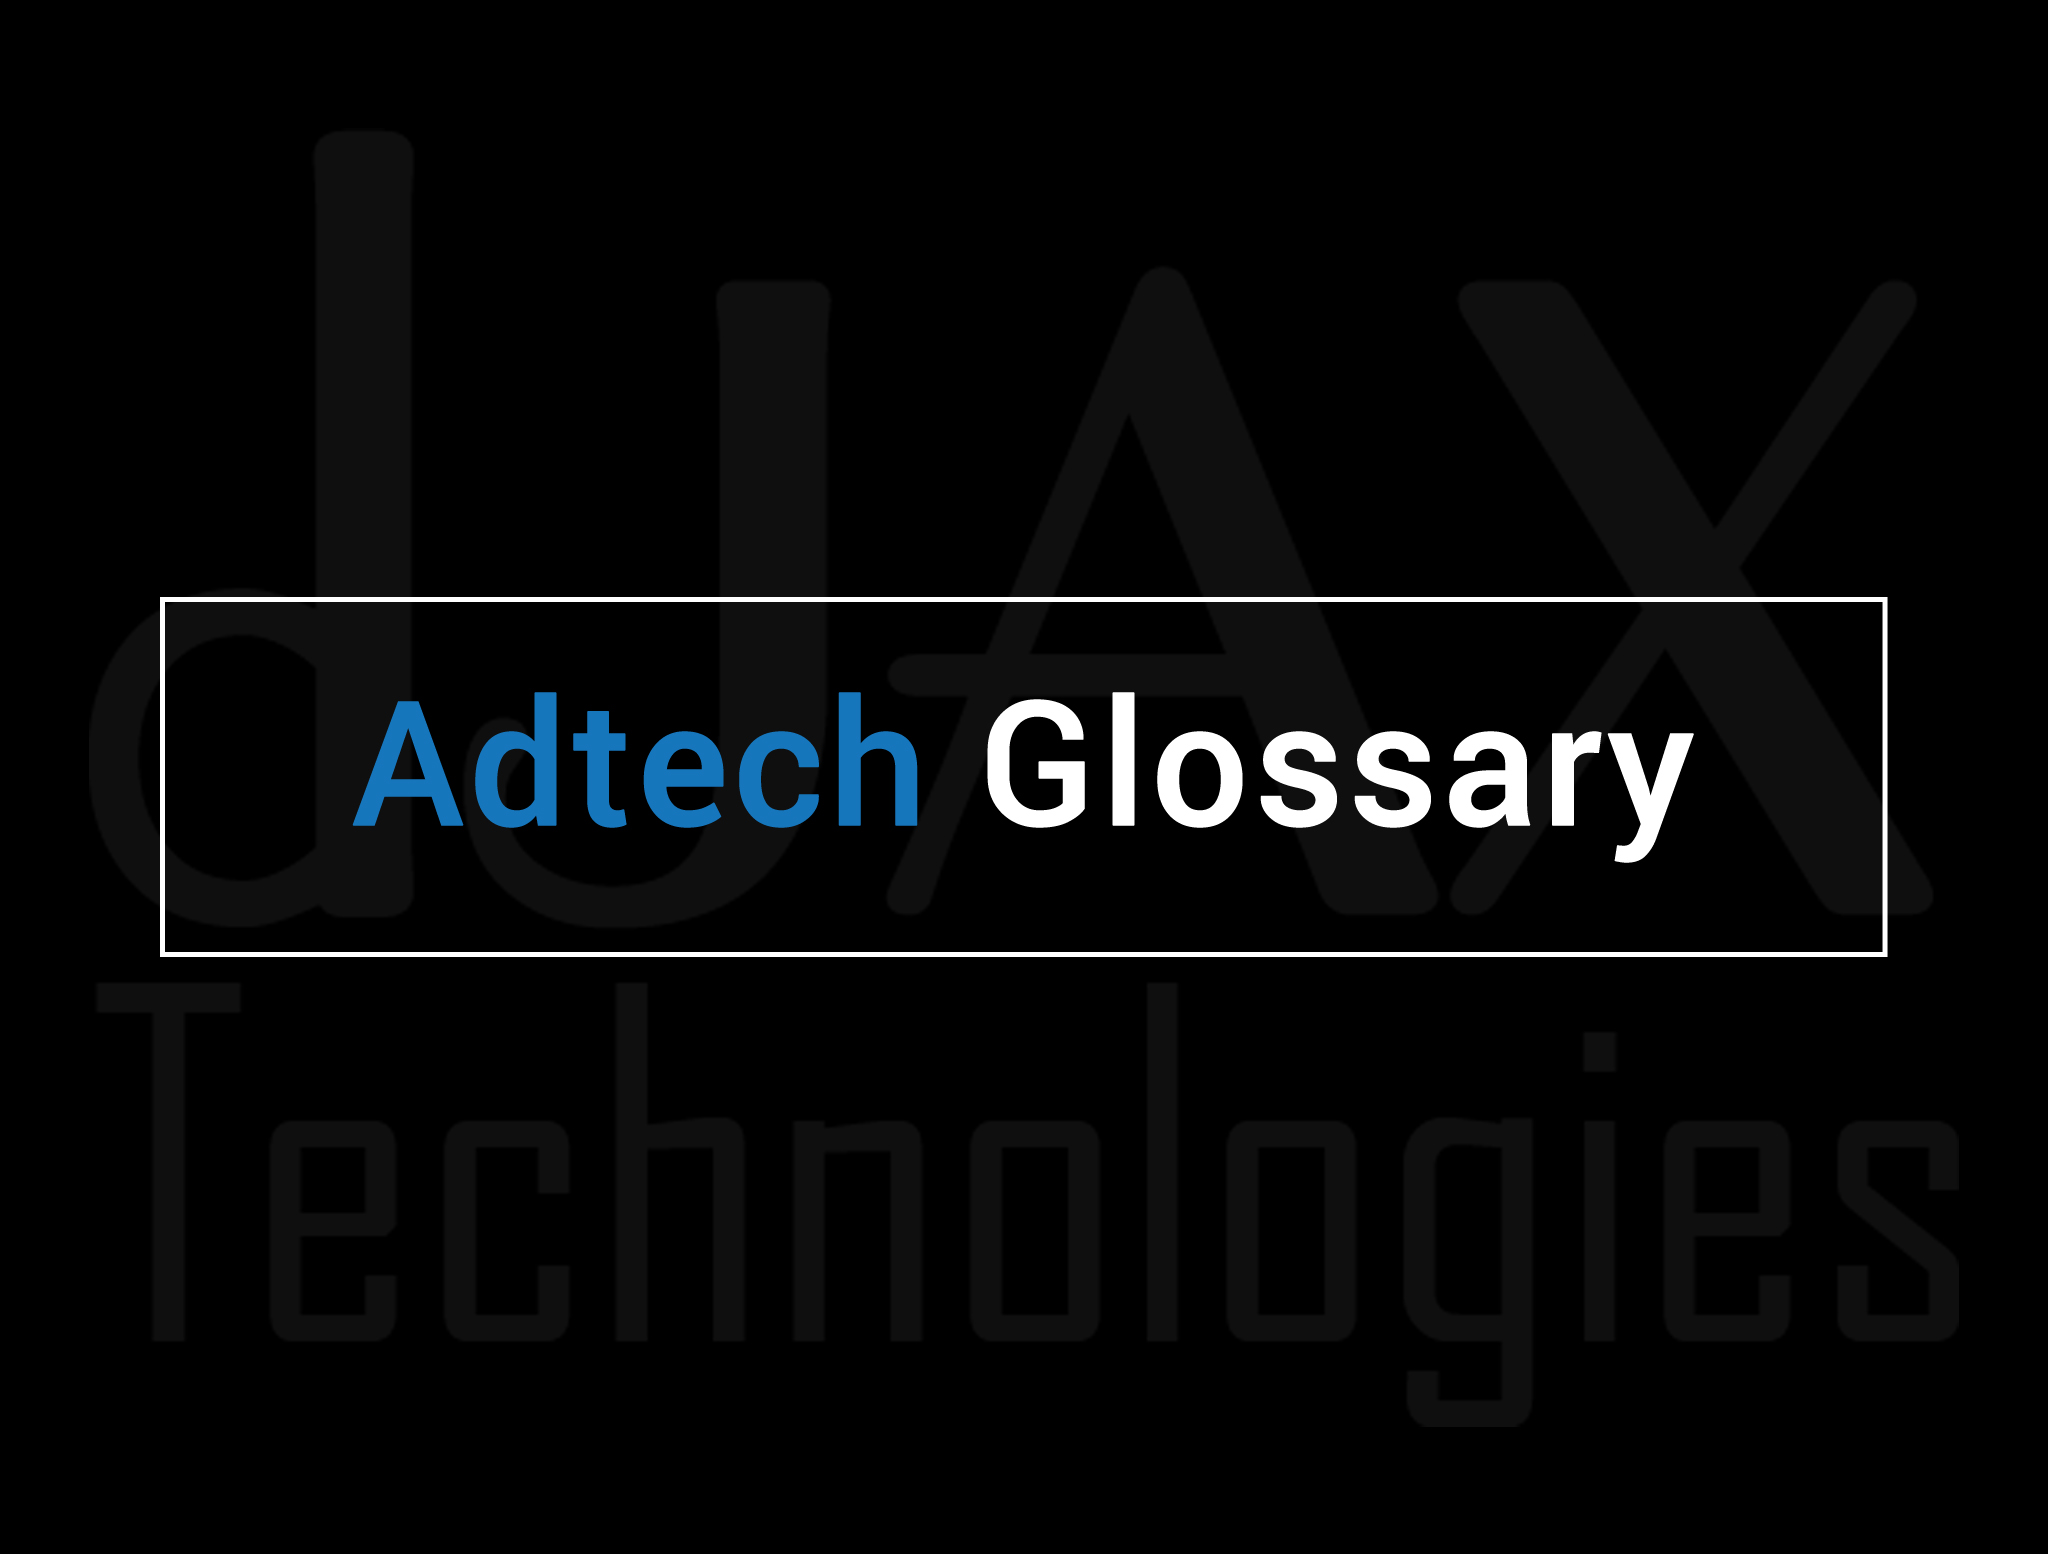 Adtech Glossary